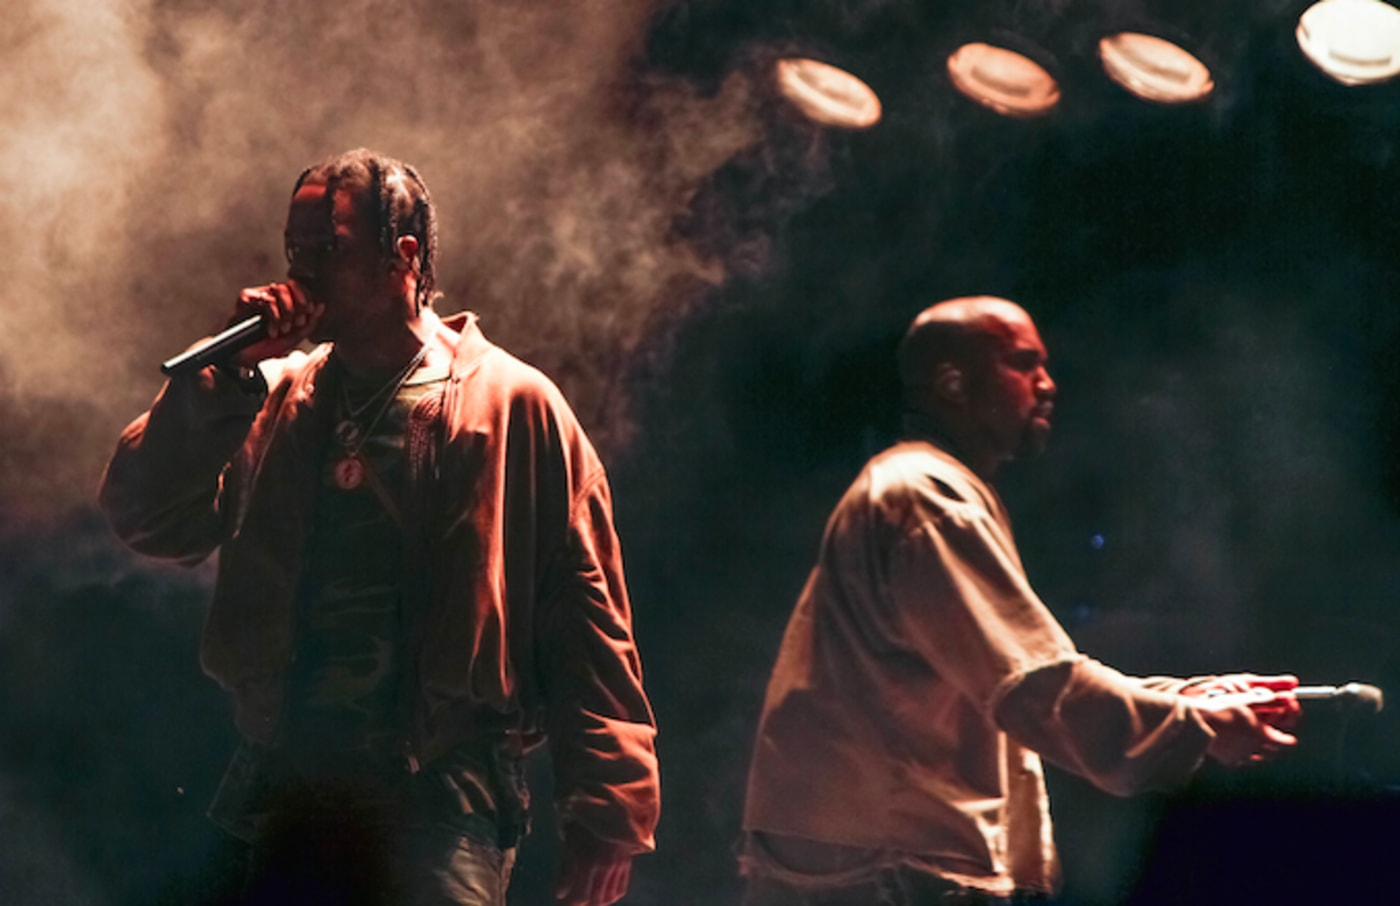 Kanye and Travis Scott